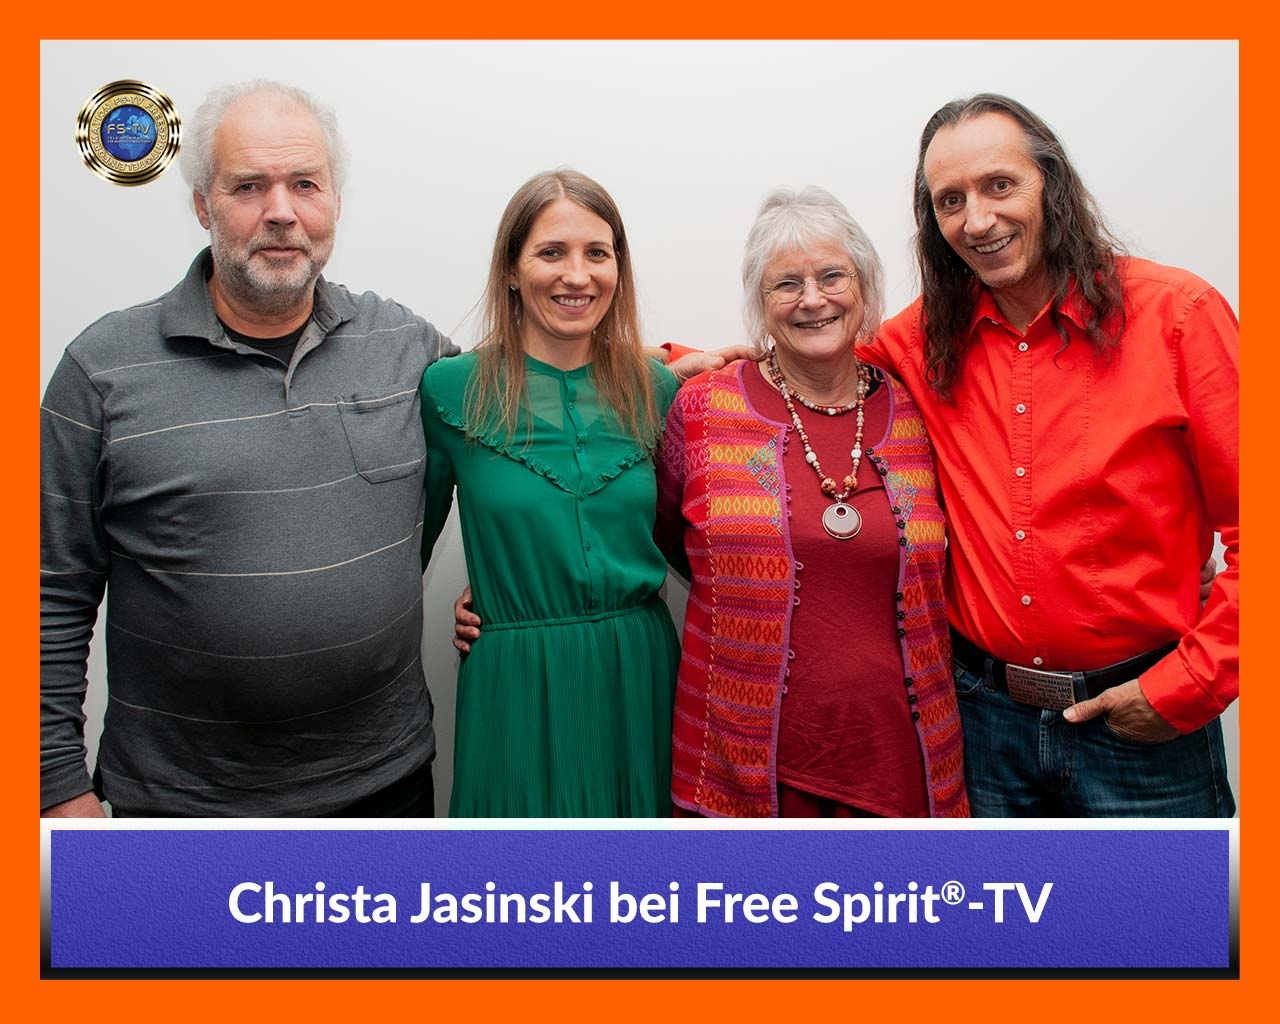 Galleriebild-Christa-Jasinski-06